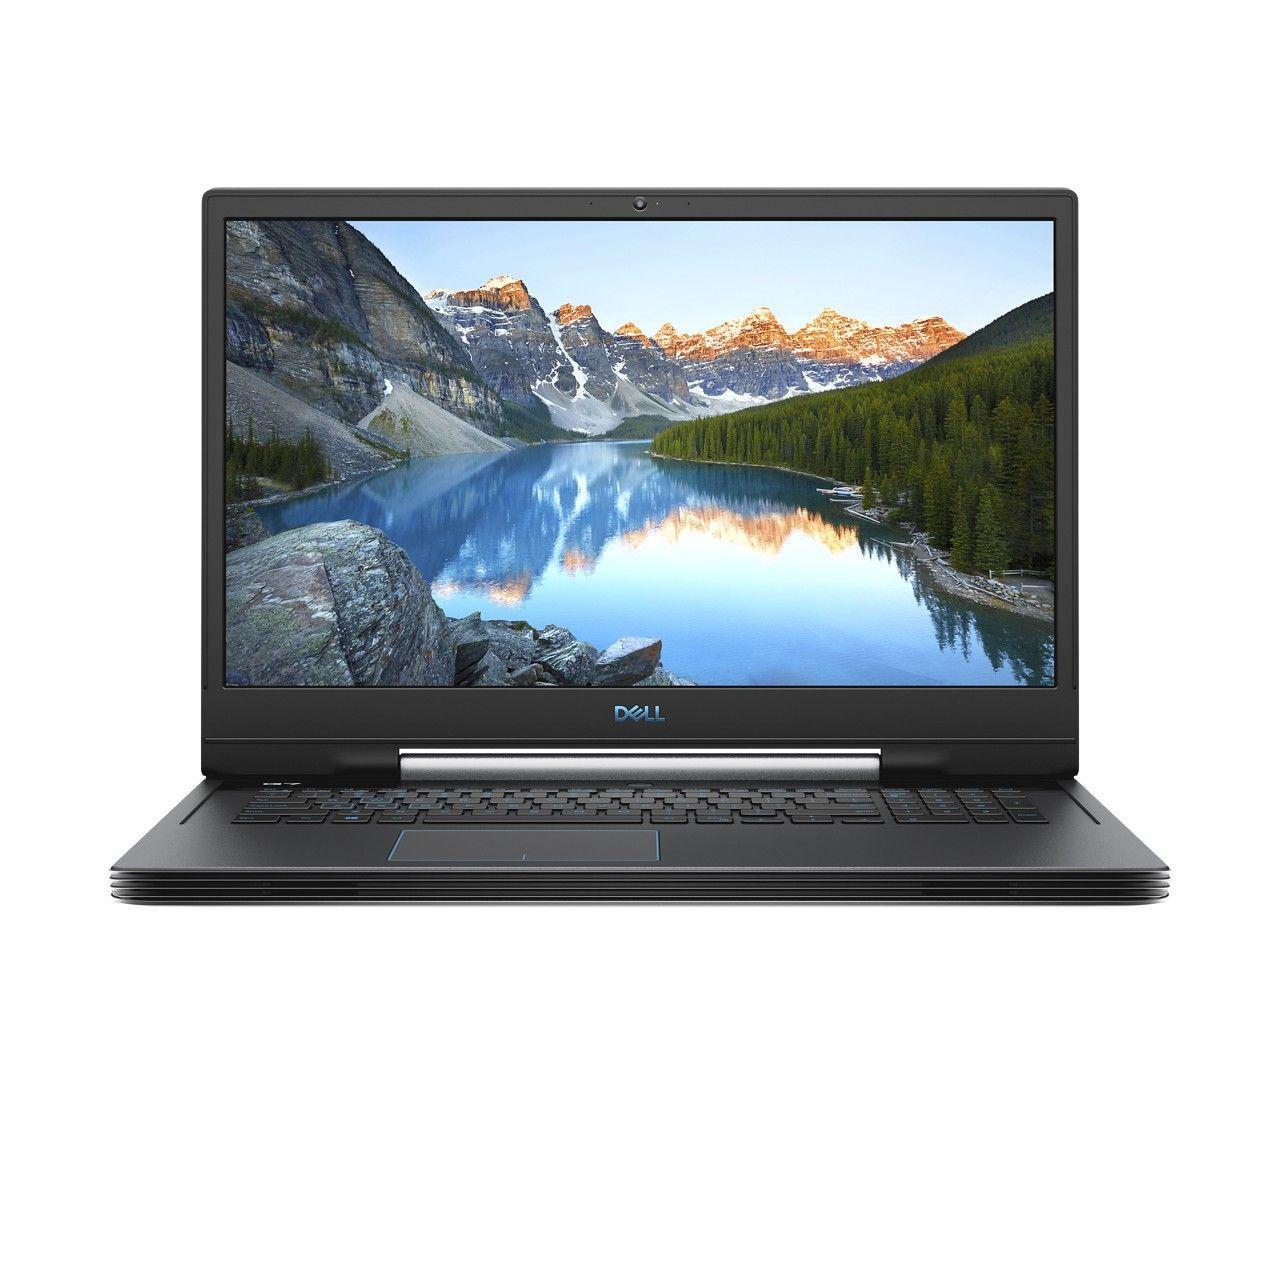 "Dell G7-E1296 Gaming Laptop i7-9750H/16 GB/1 TB HDD + 256 GB SSD/NVIDIA GeForce RTX 2060 6 GB/17.3"" FHD/60Hz Refresh Rate/Windows 10/Grey"